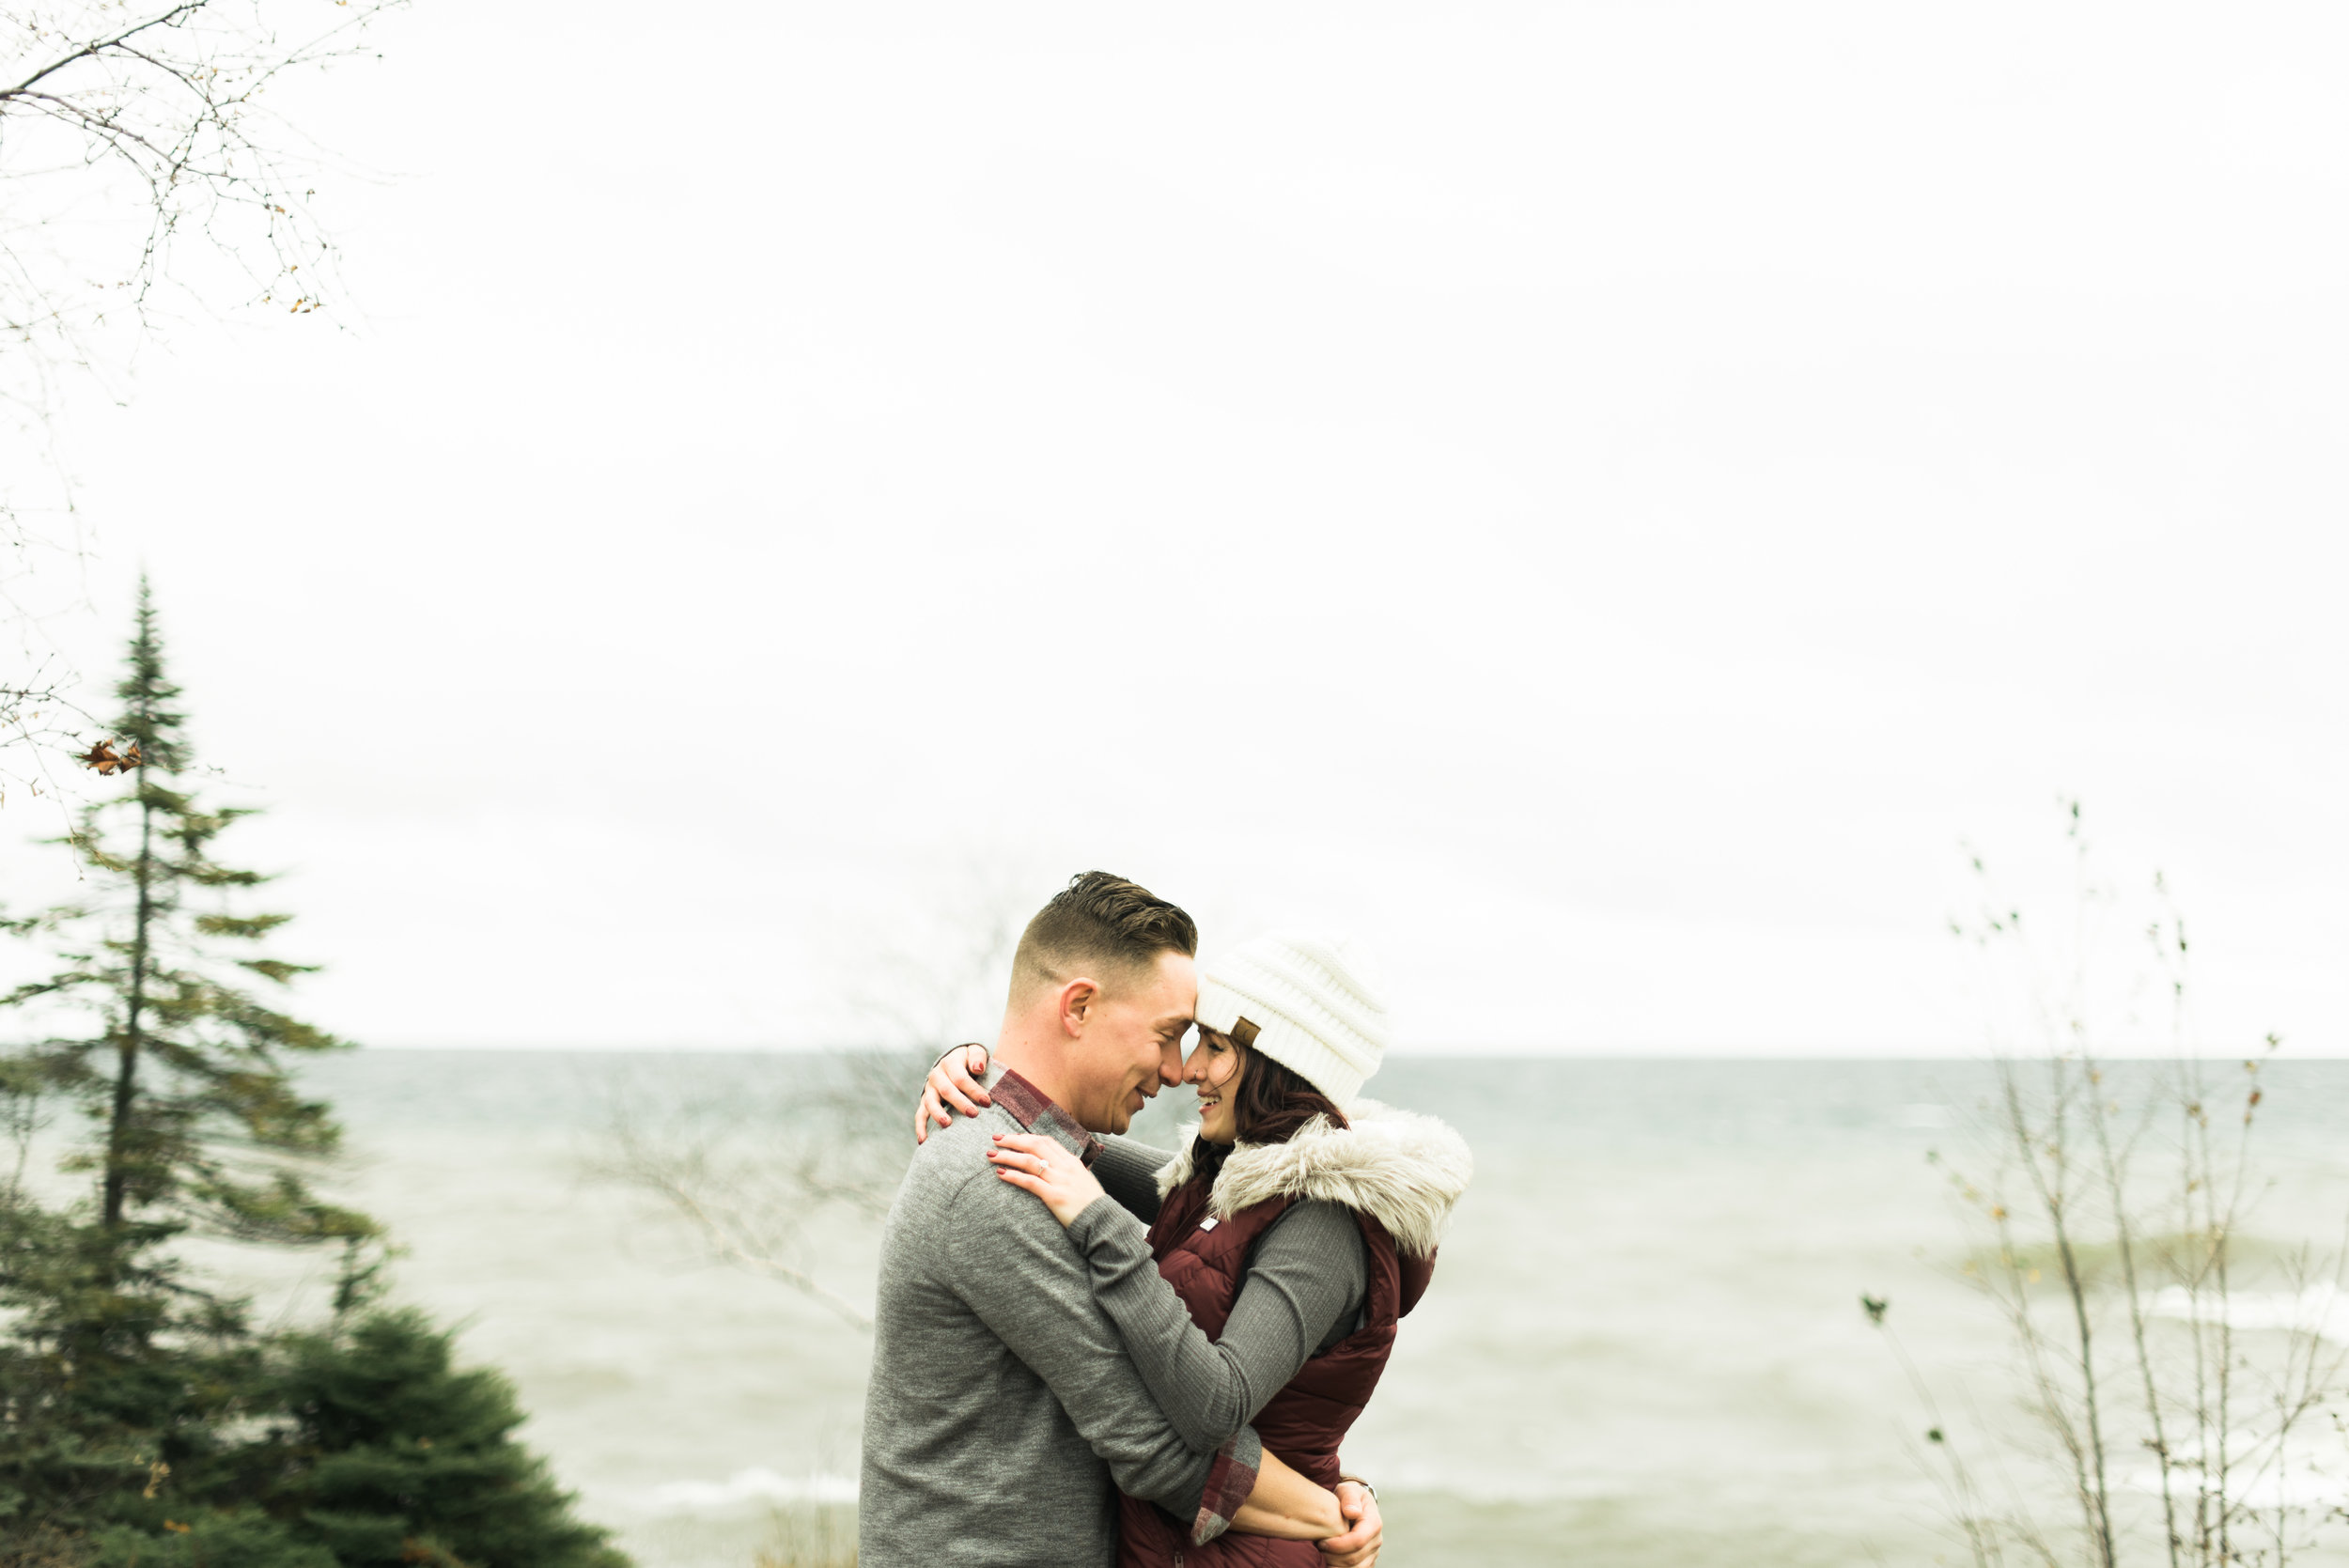 20171104Andrea+Cory_Engagement56.jpg